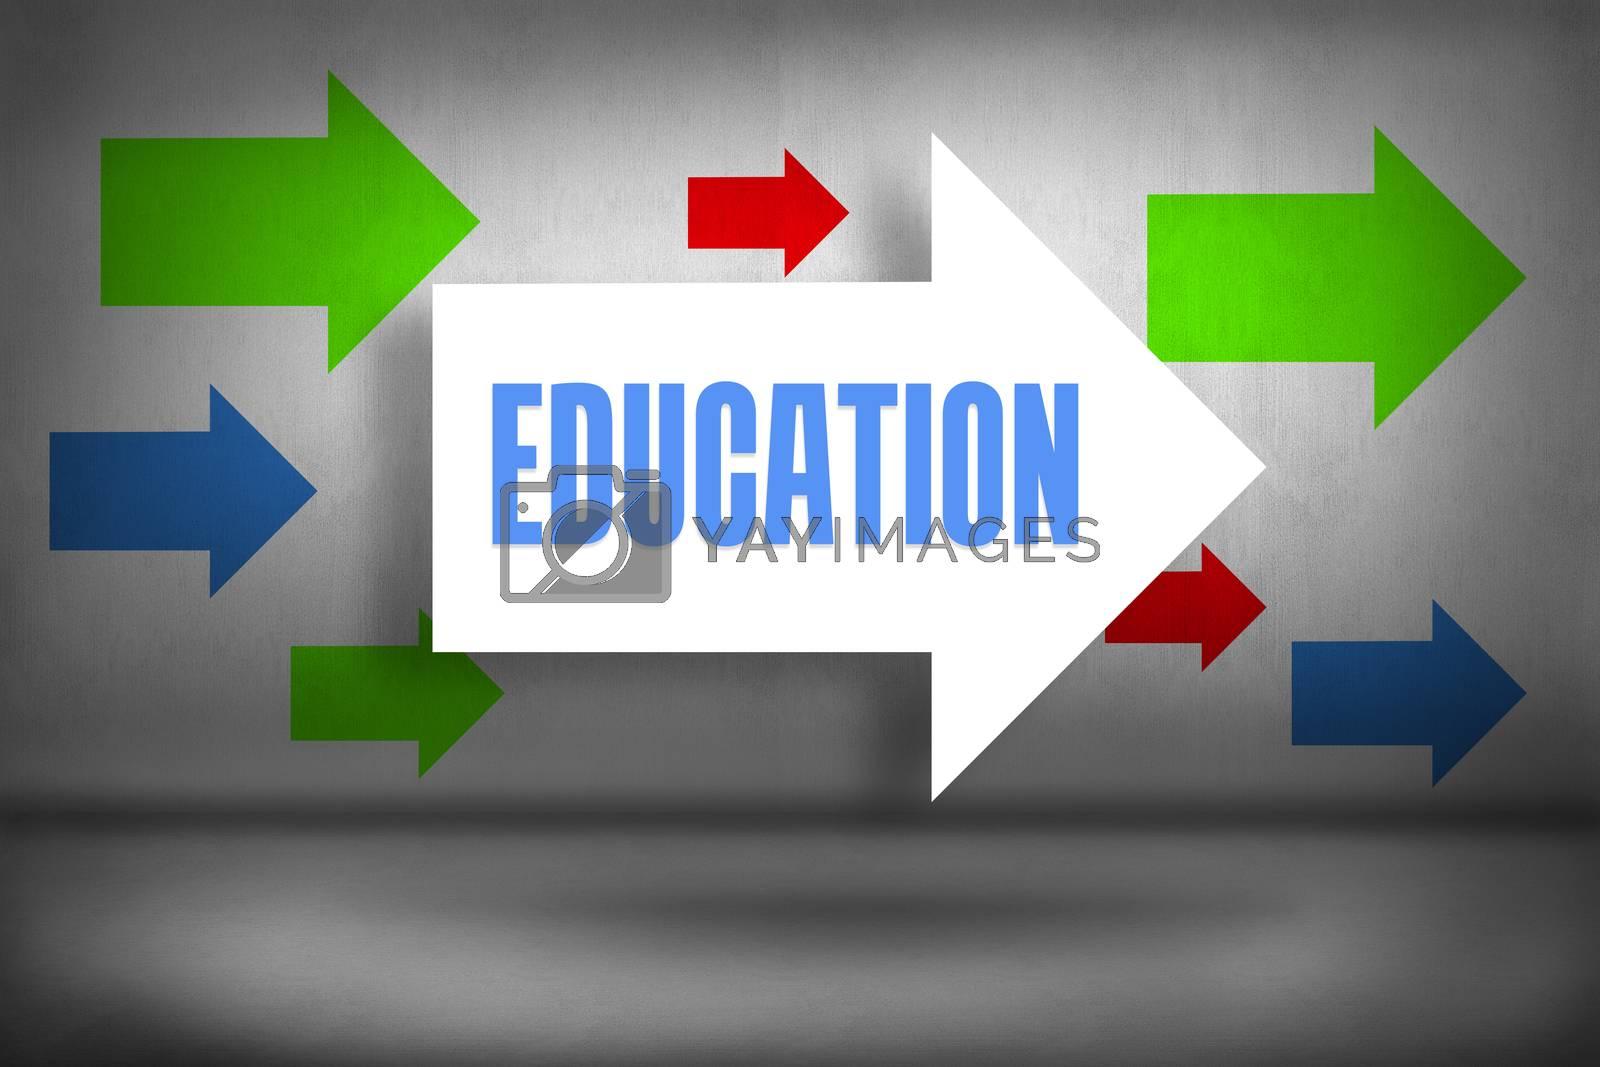 Education against arrows pointing by Wavebreakmedia